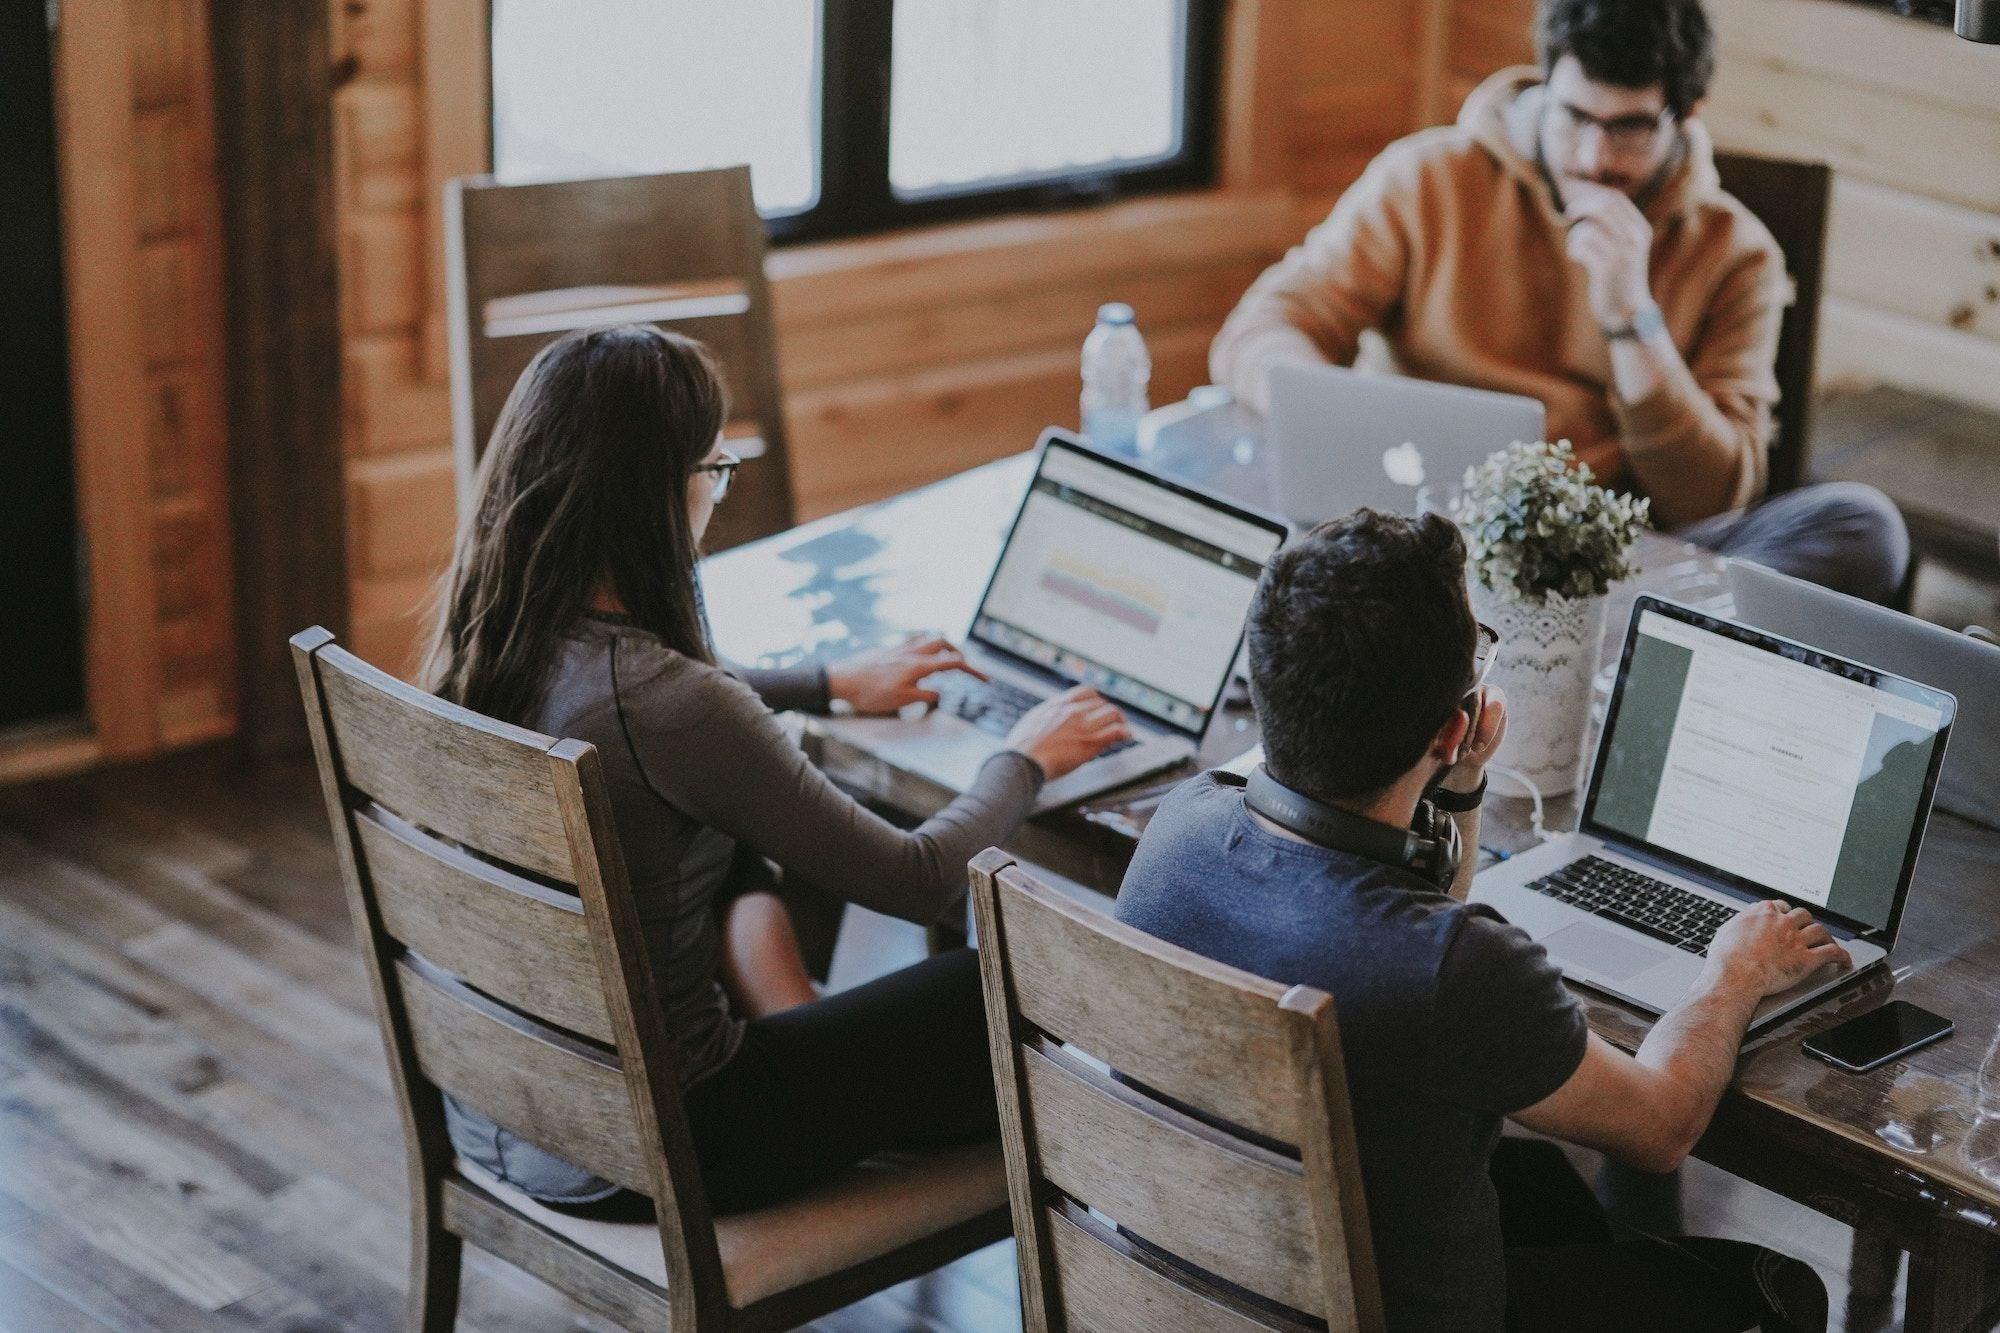 entrepreneur.com - Retargeting for Small Business: The Basics